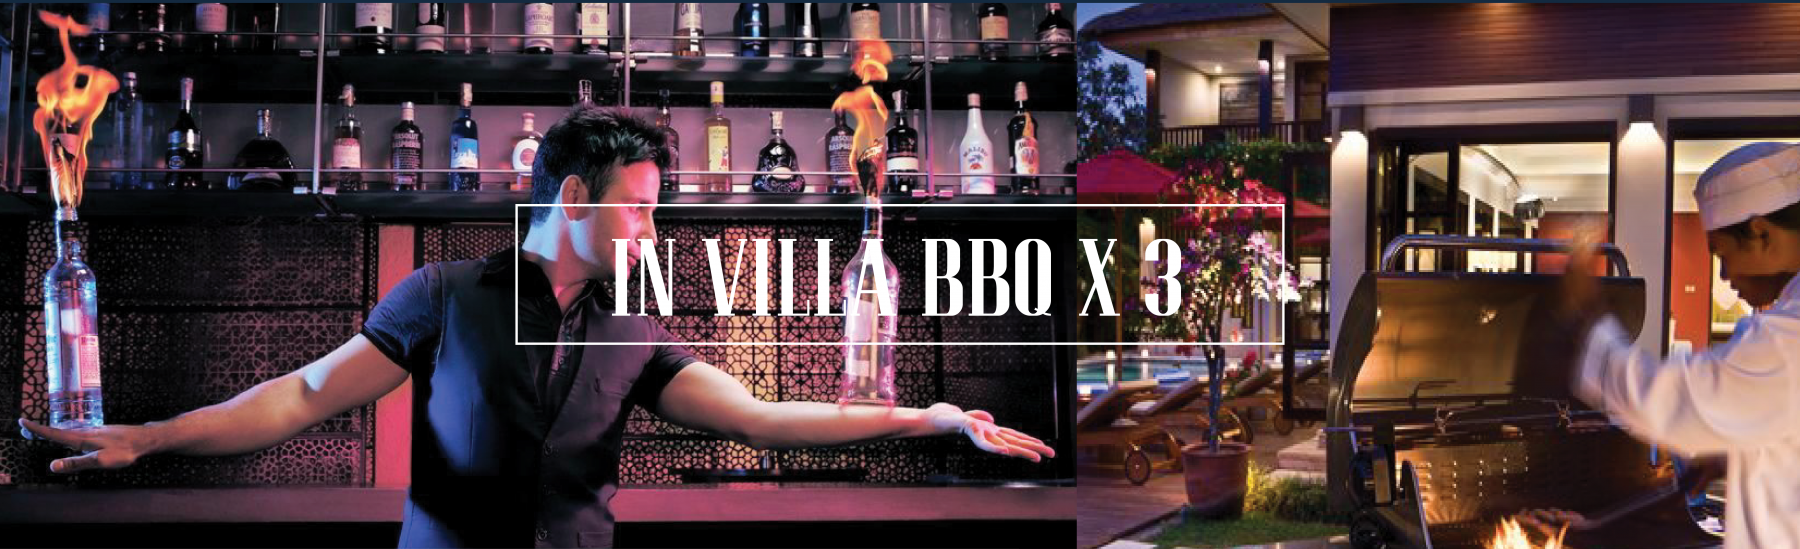 in-villa-bbq-x3